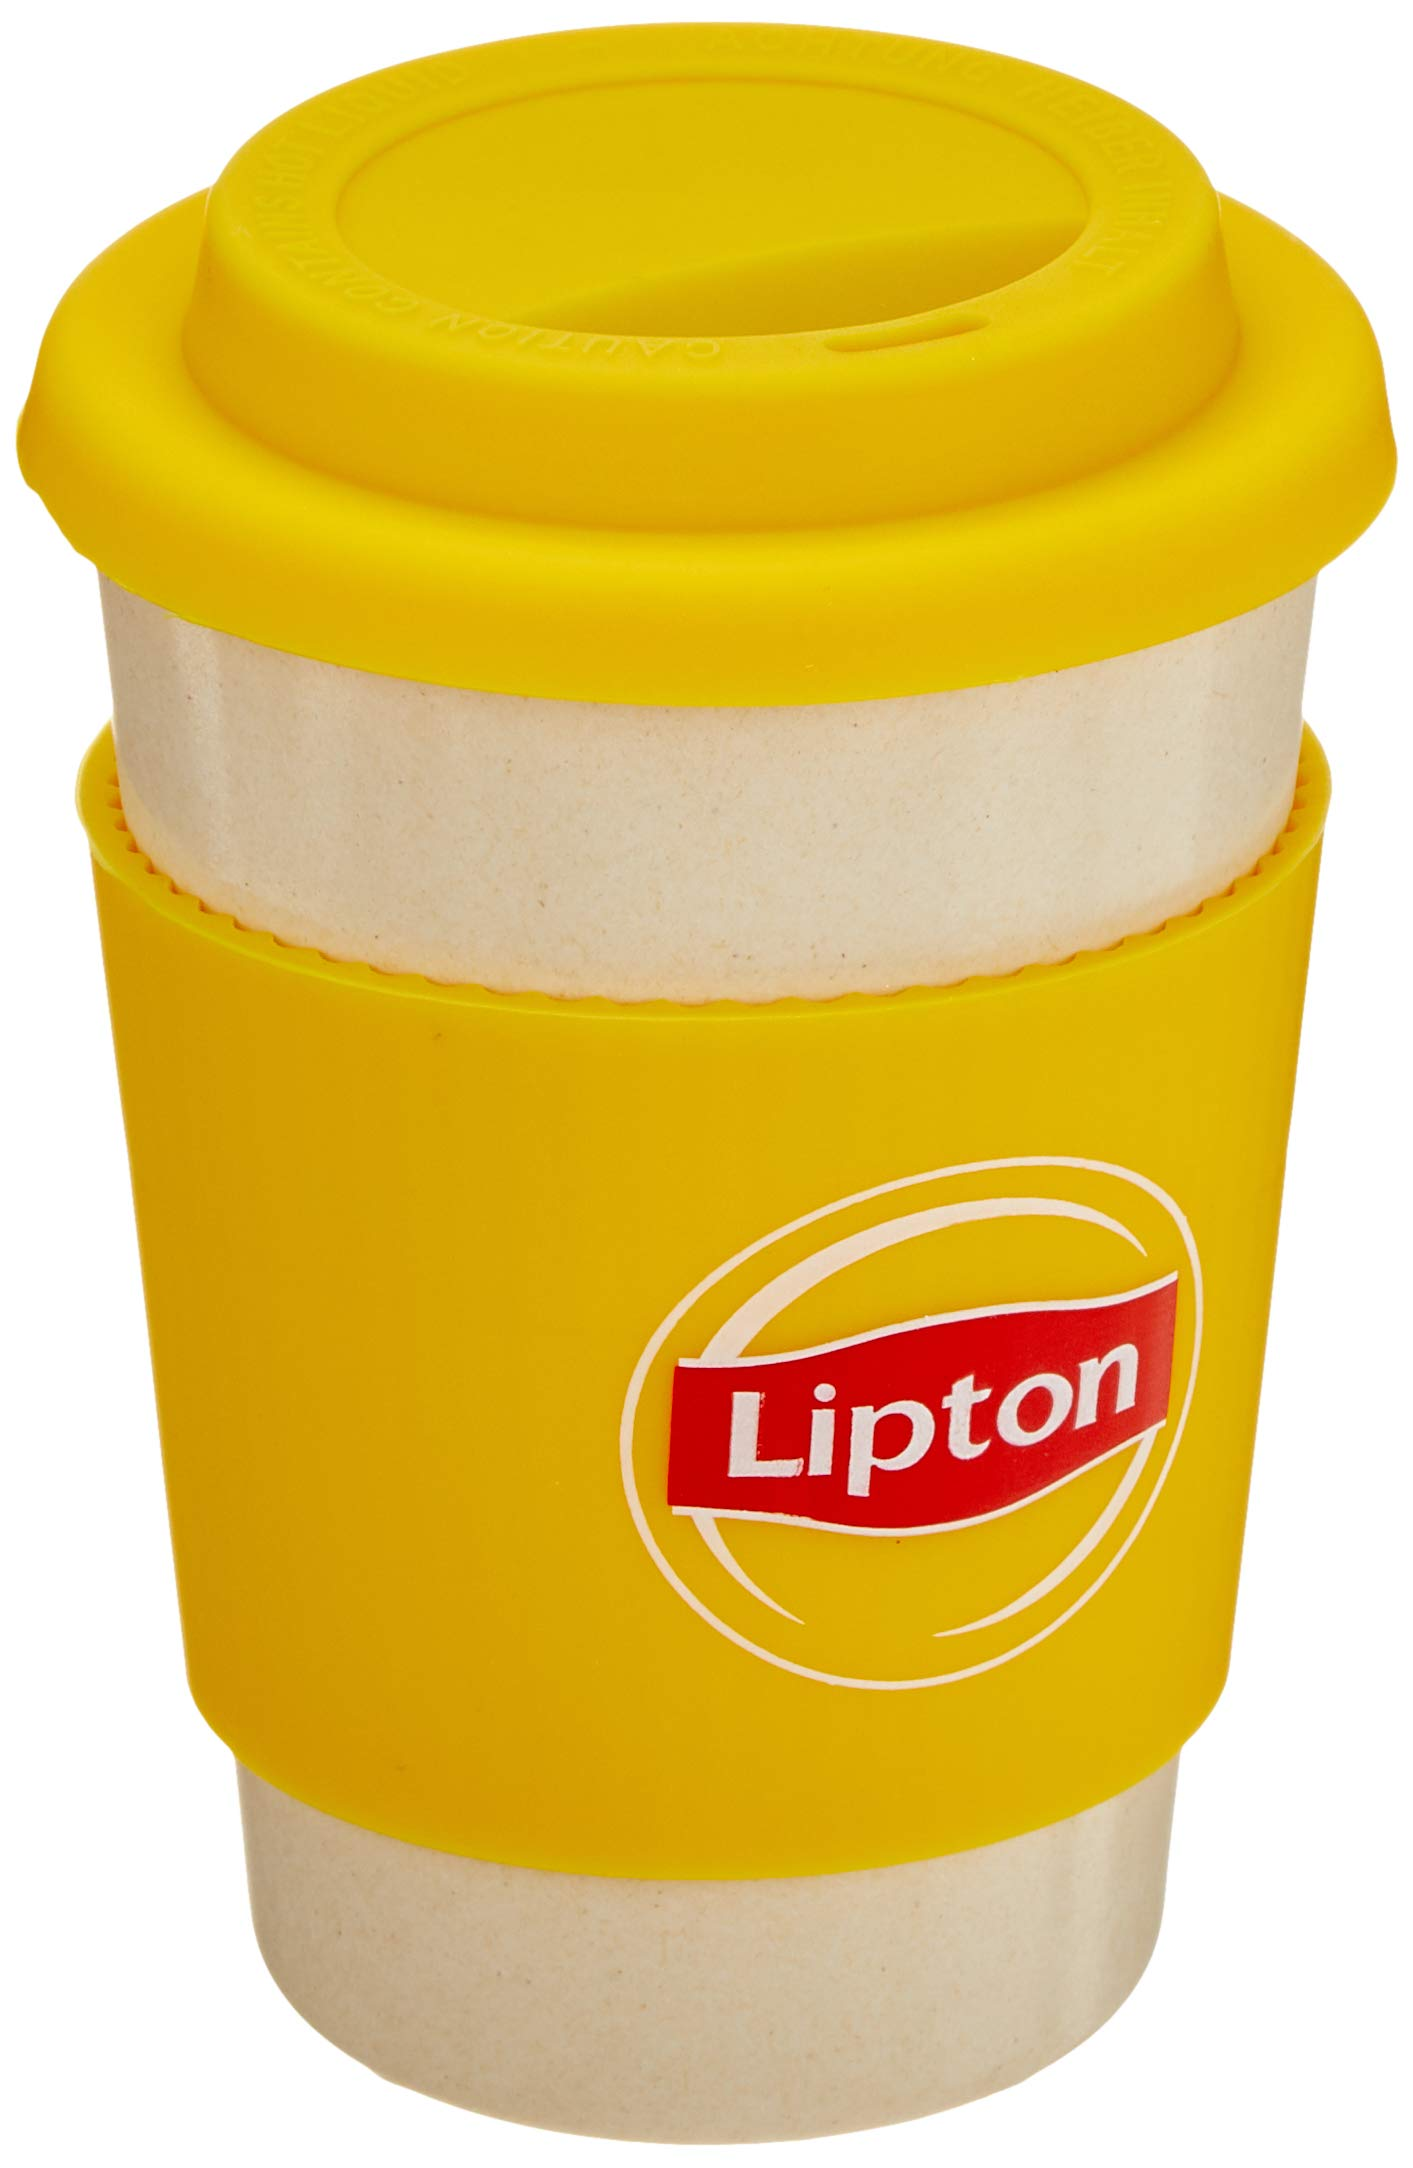 Lipton-Tee-To-Go-Becher-aus-Bambus-107-g